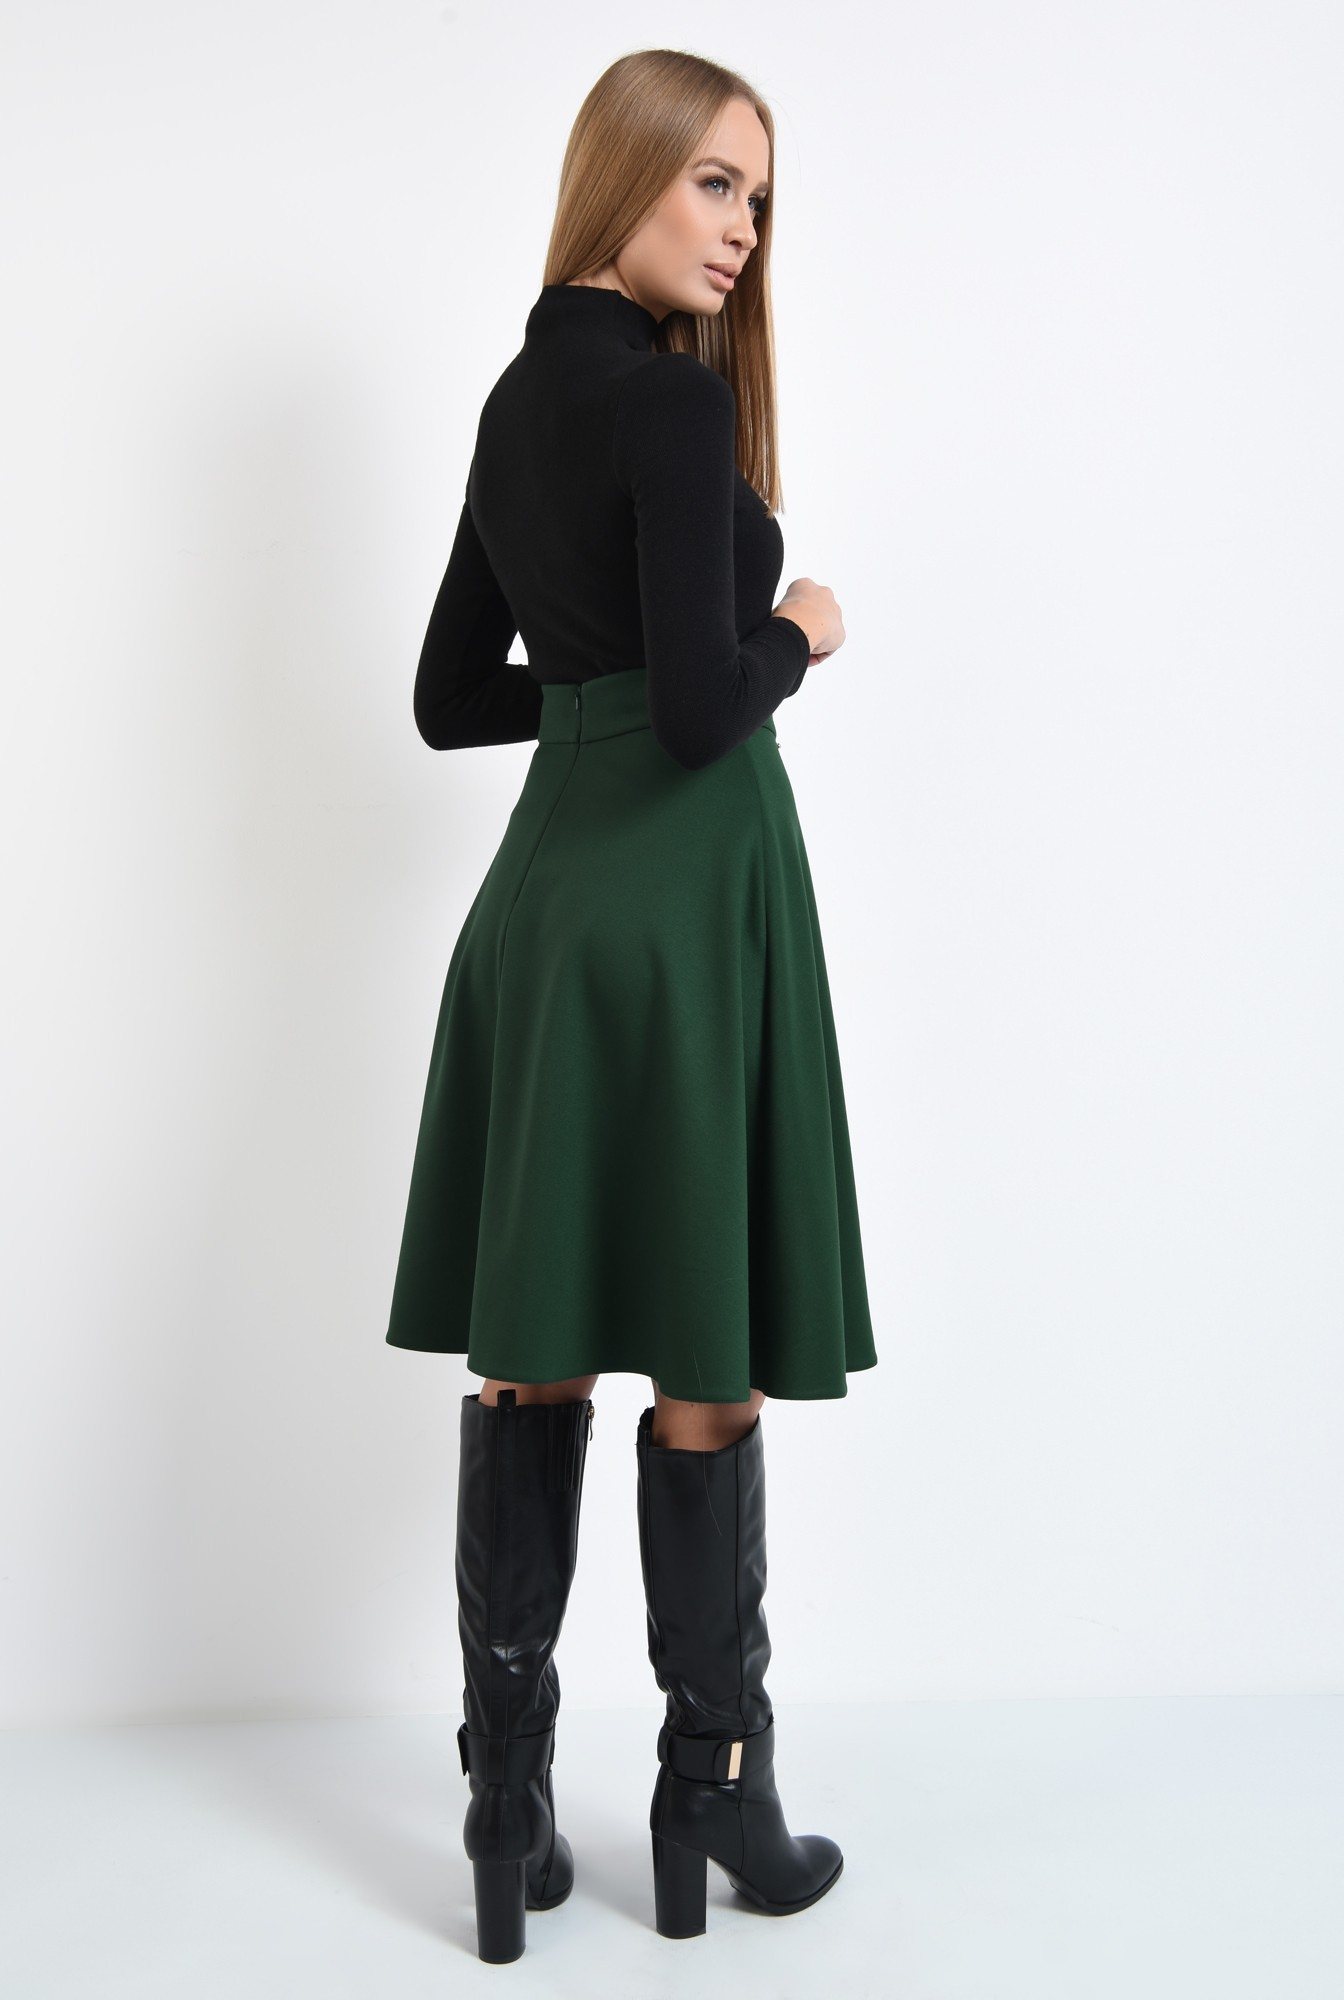 1 - fusta verde, clos, midi, tesatura elastica